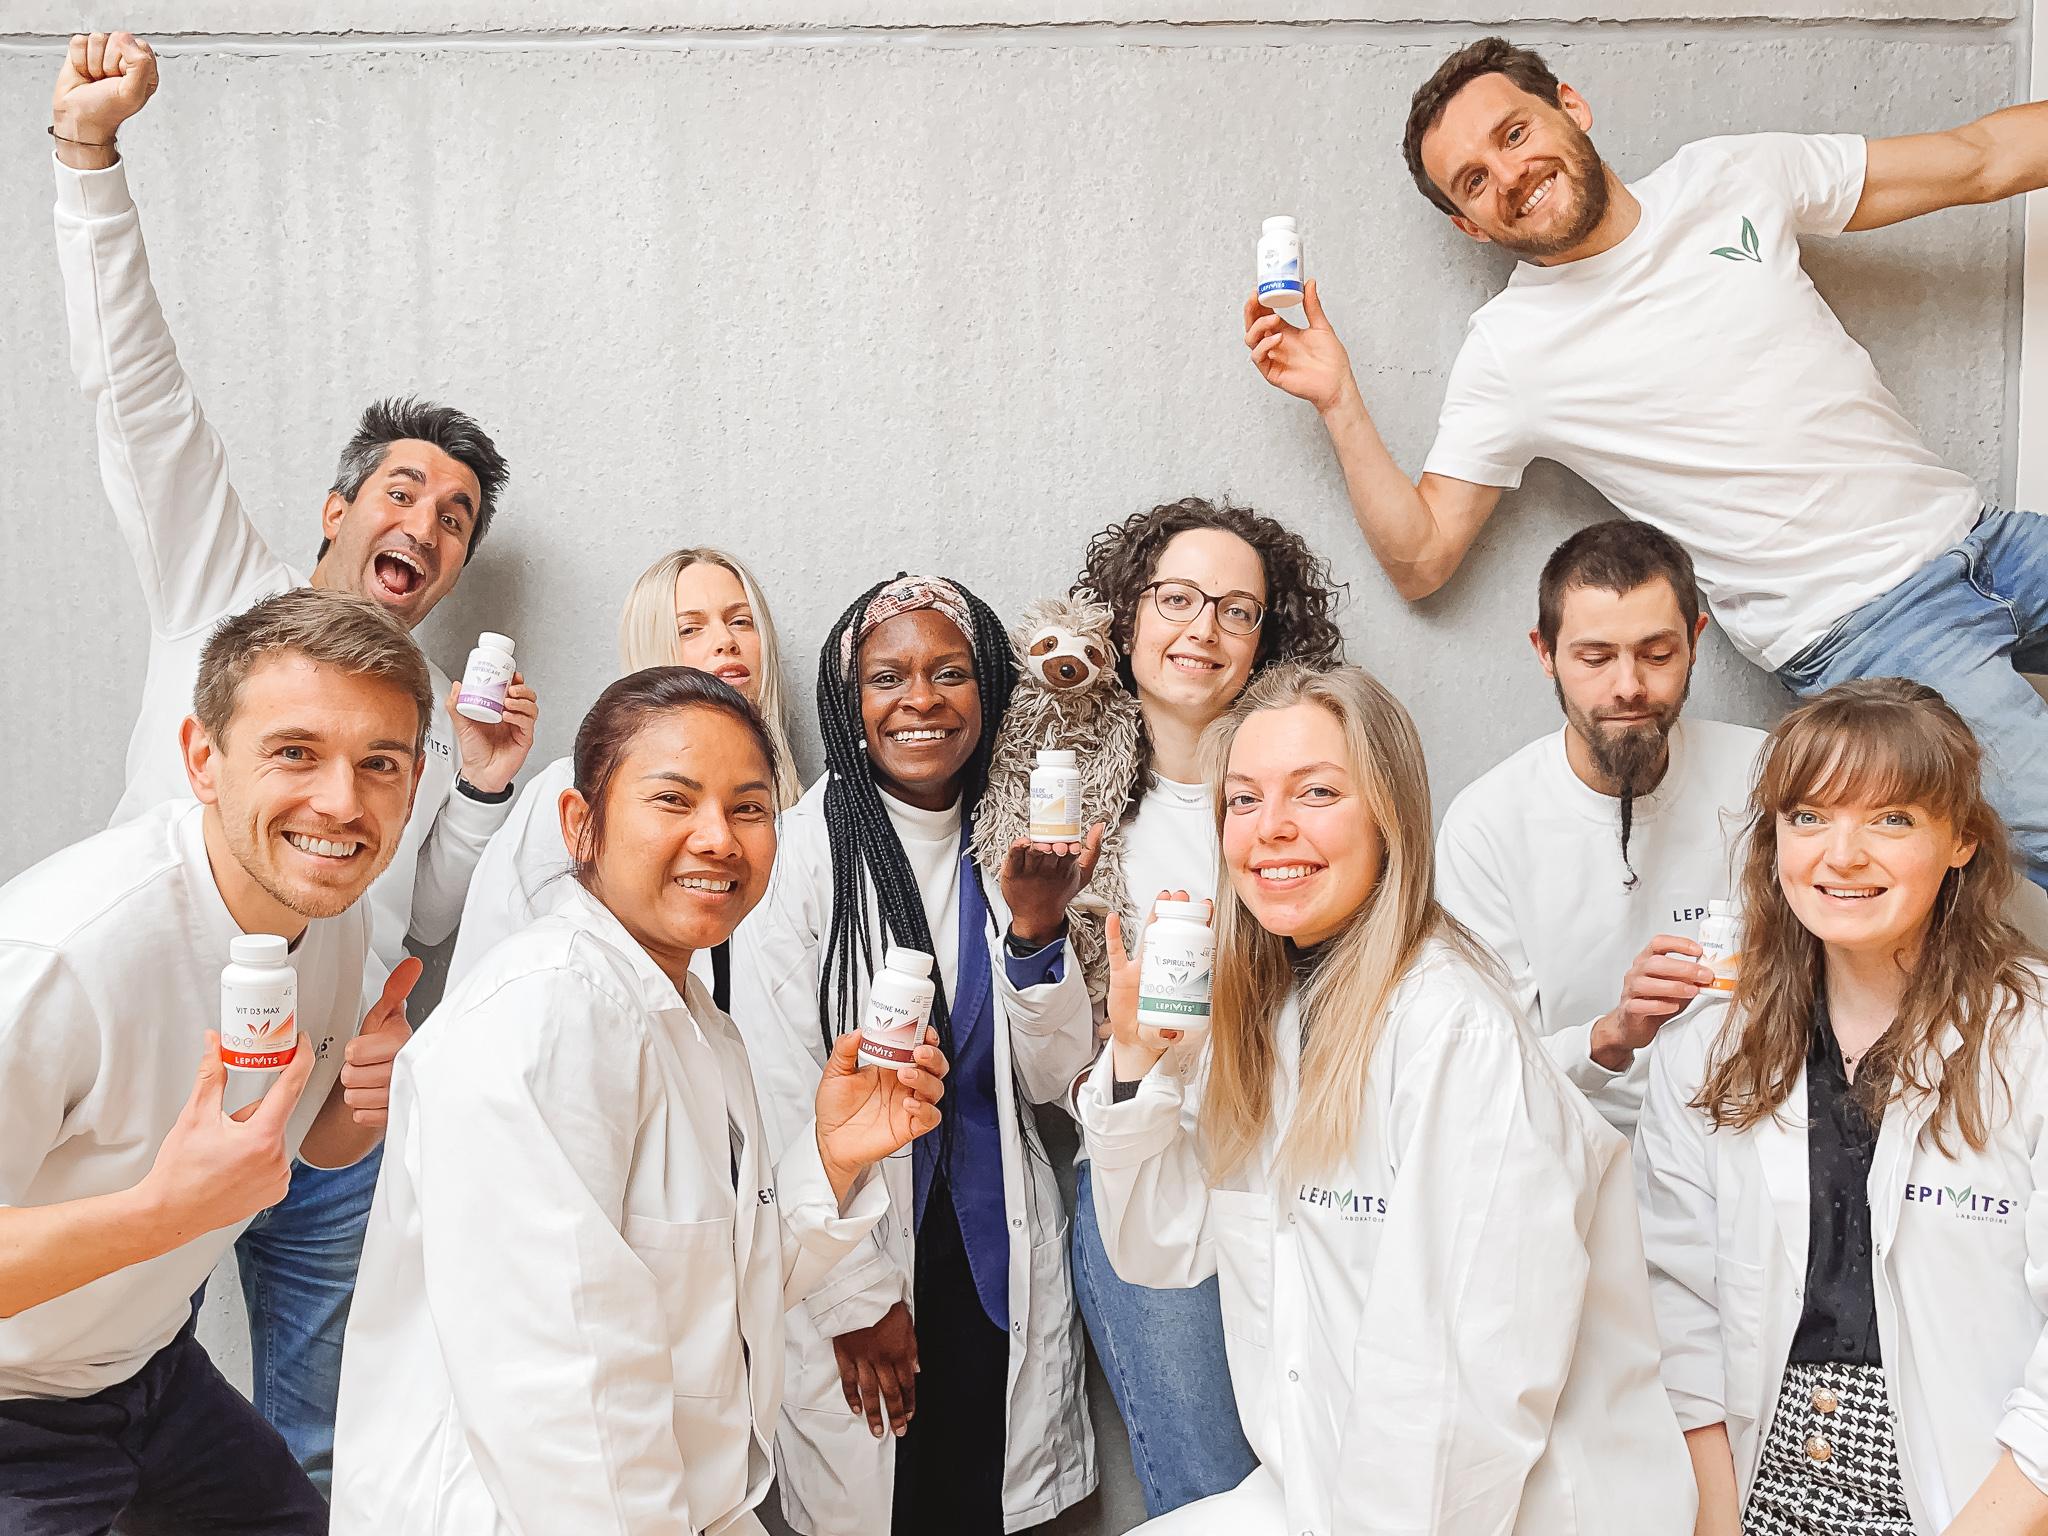 LEPIVITS - Startup belge - Compléments alimentaires